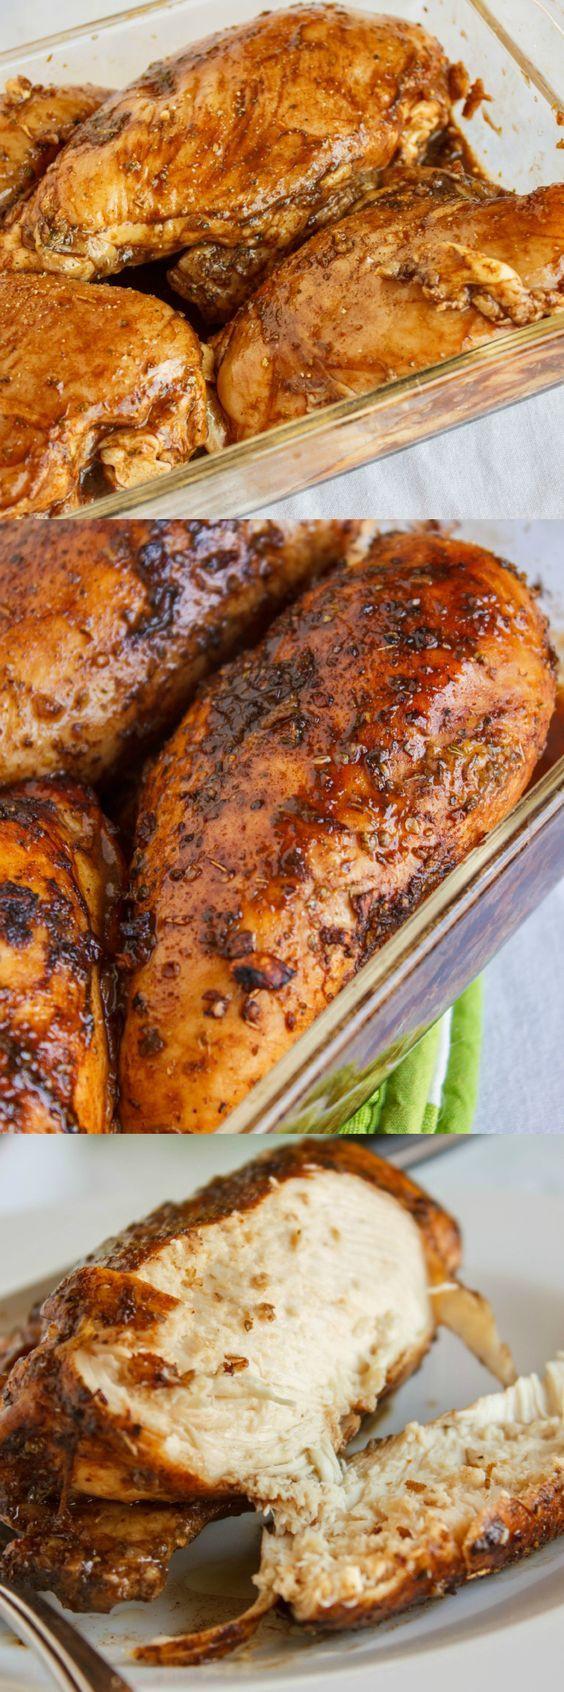 Healthy Baked Chicken Breast  Baked Balsamic Chicken Recipe